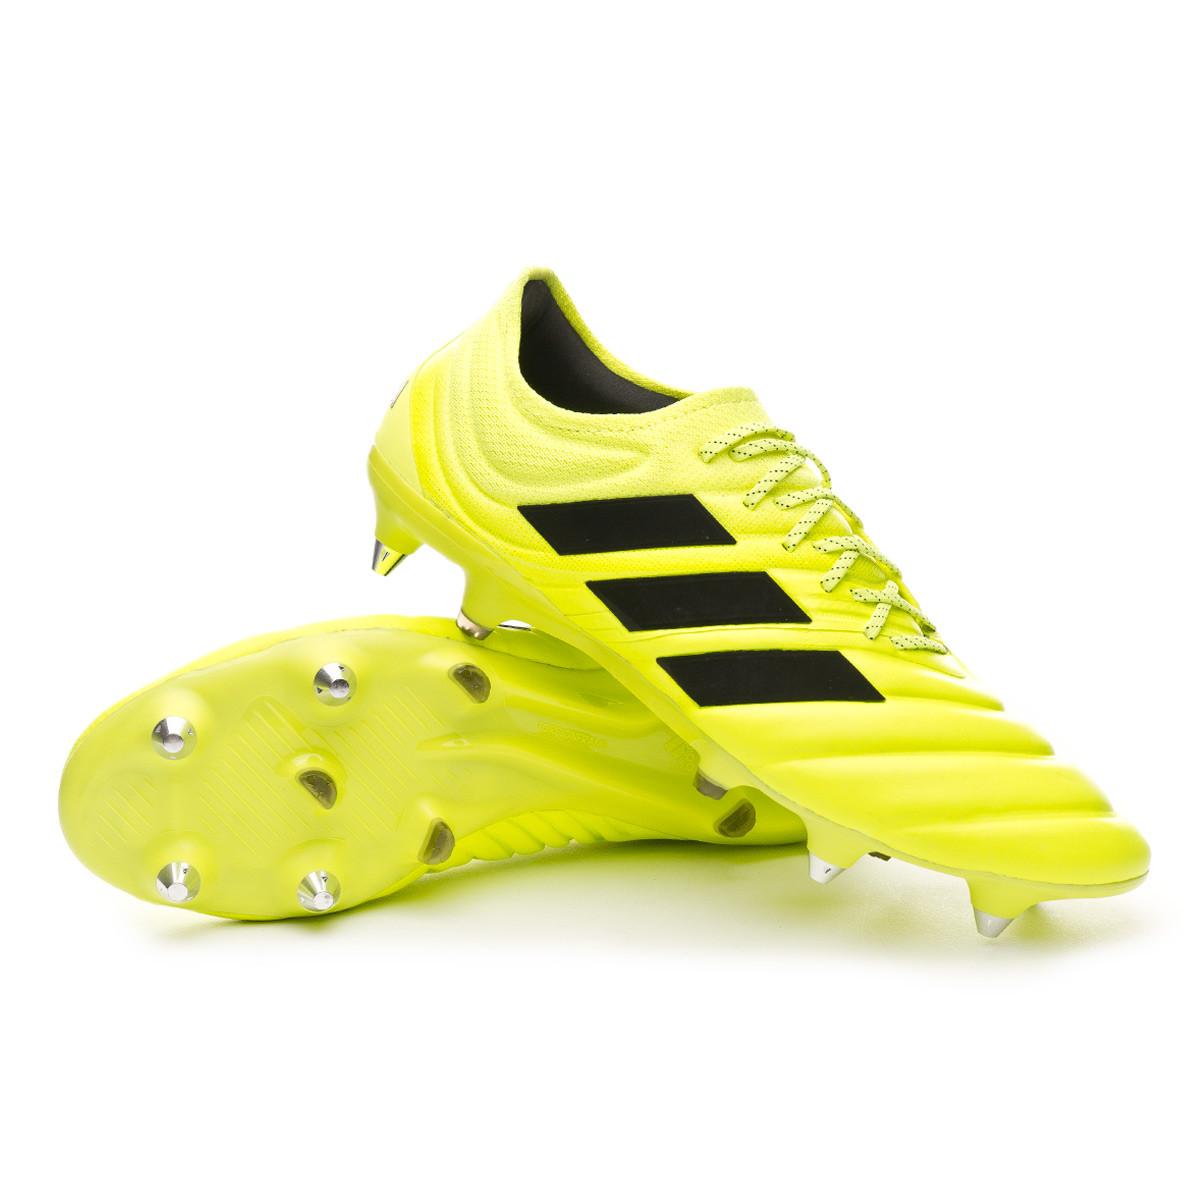 Chaussure de foot adidas Copa 19.1 SG